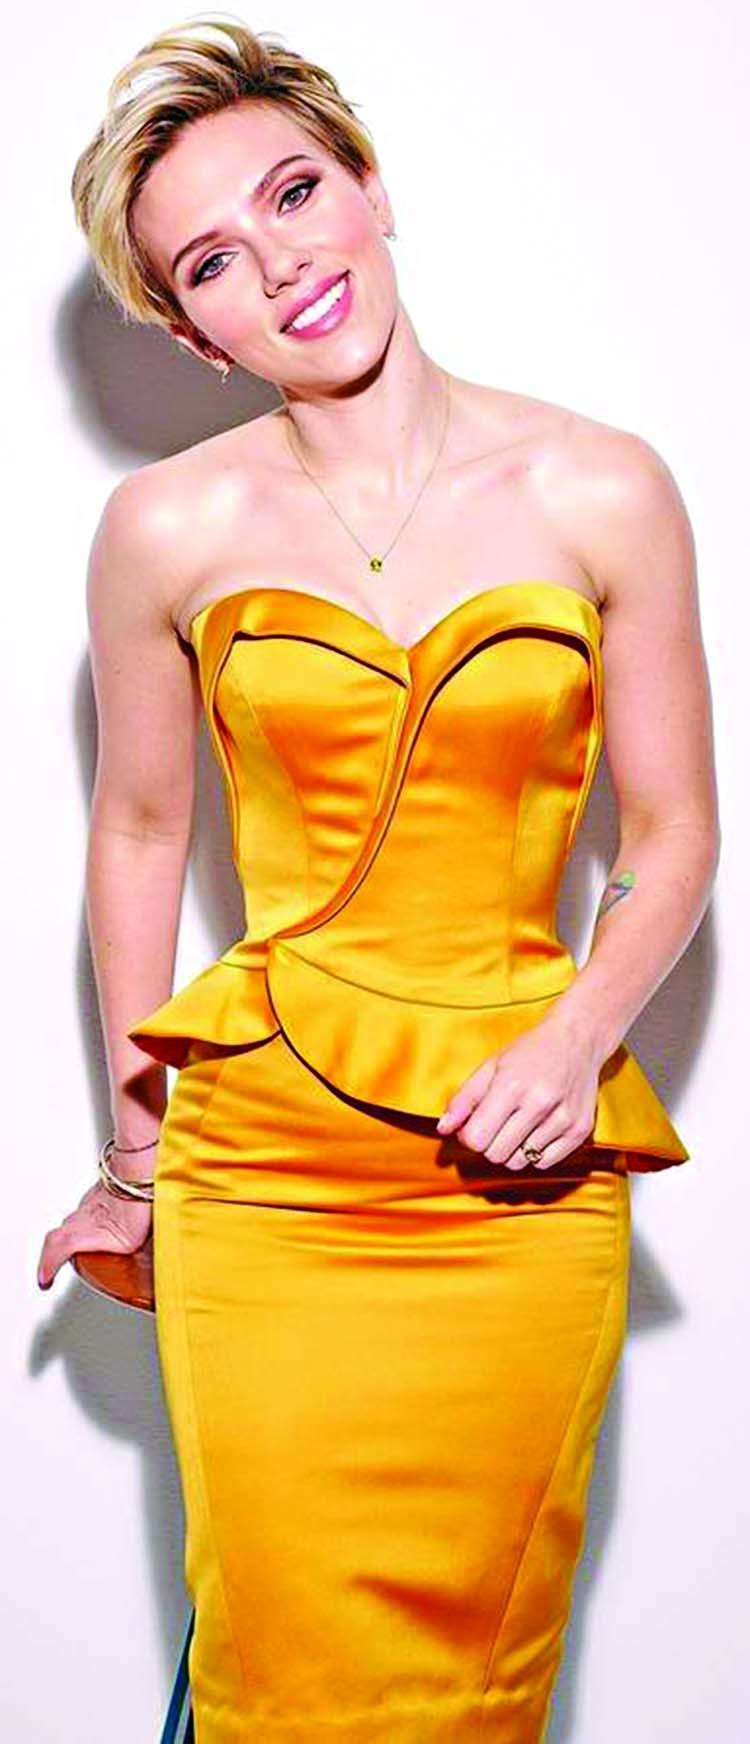 Scarlett Johansson shows off back tattoo